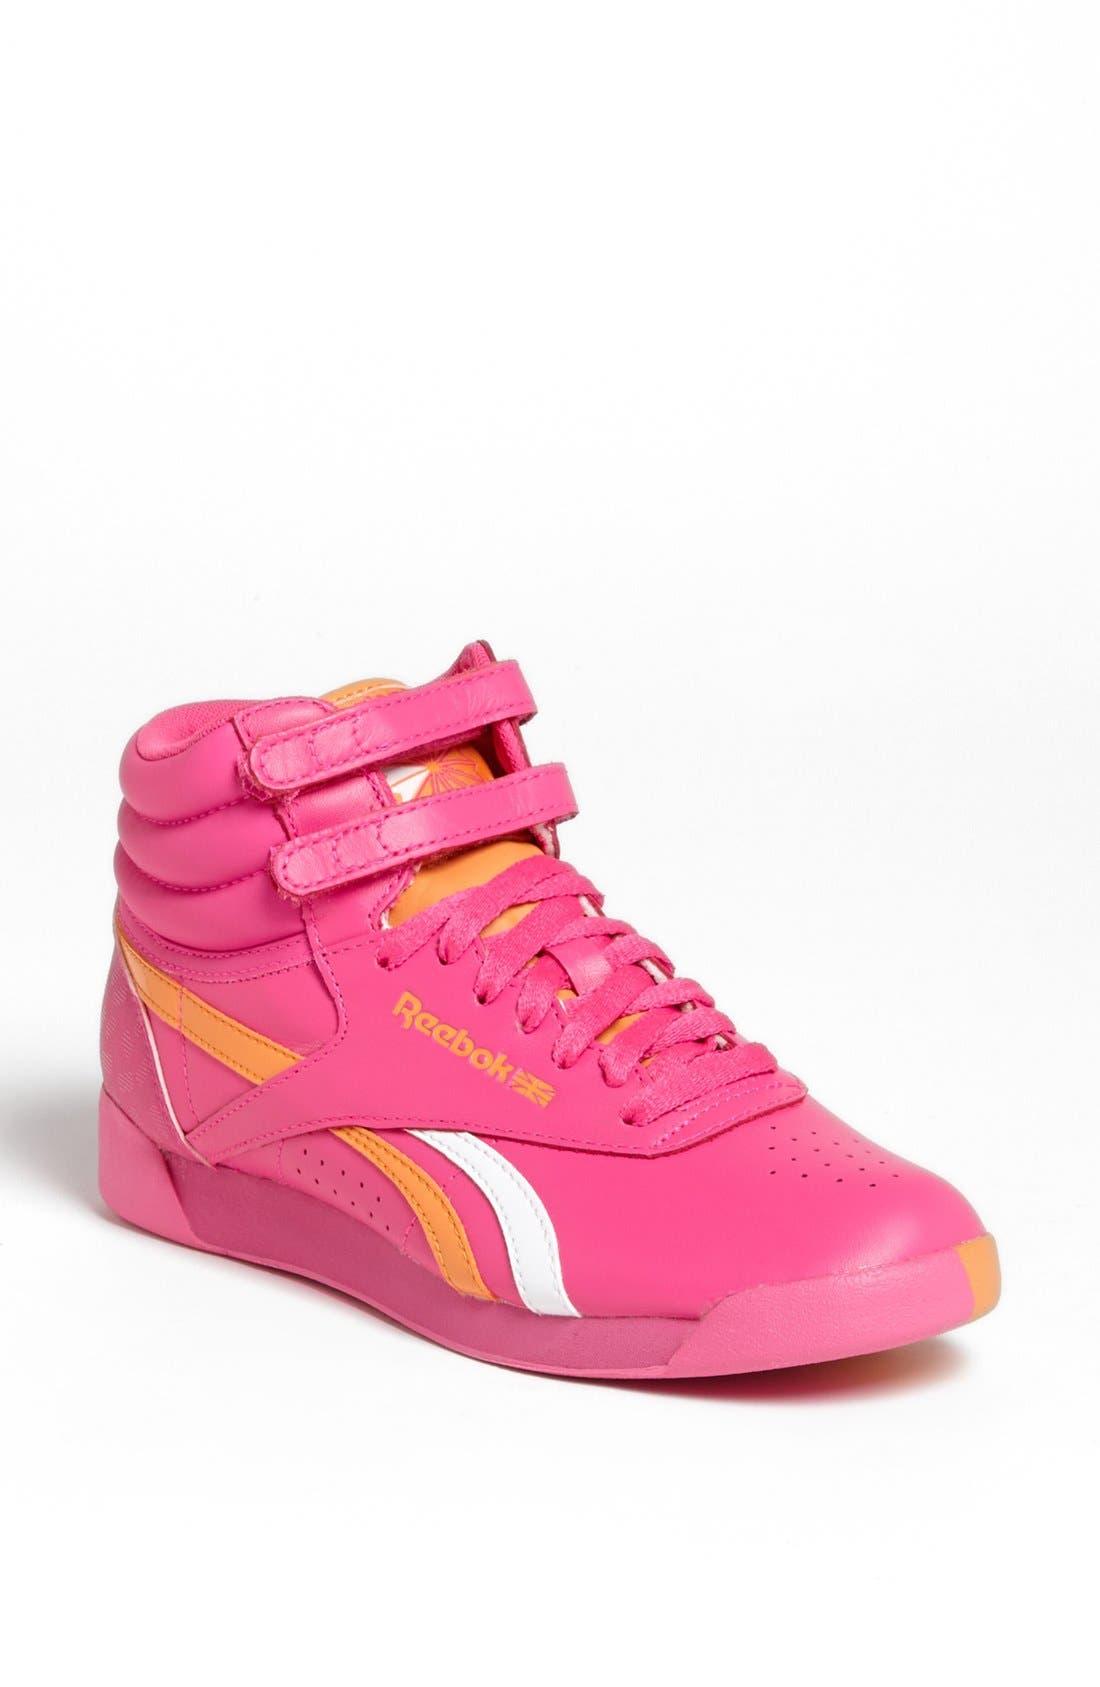 Alternate Image 1 Selected - Reebok 'F/S Hi Splitz' High Top Sneaker (Women)